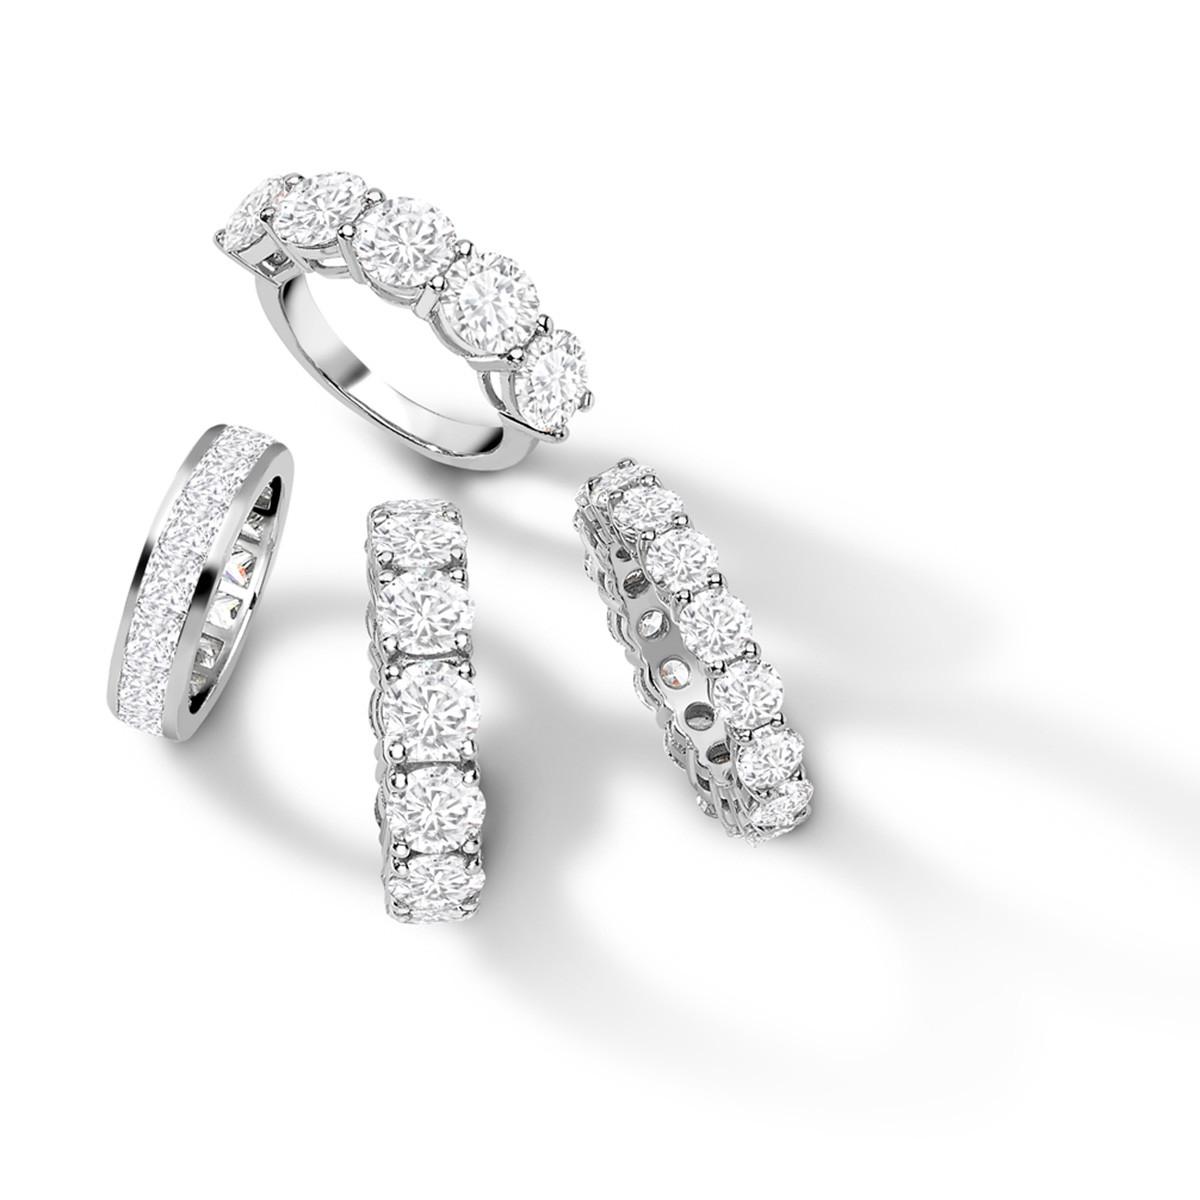 Eternity Rings - Riverton Diamond in Platinum